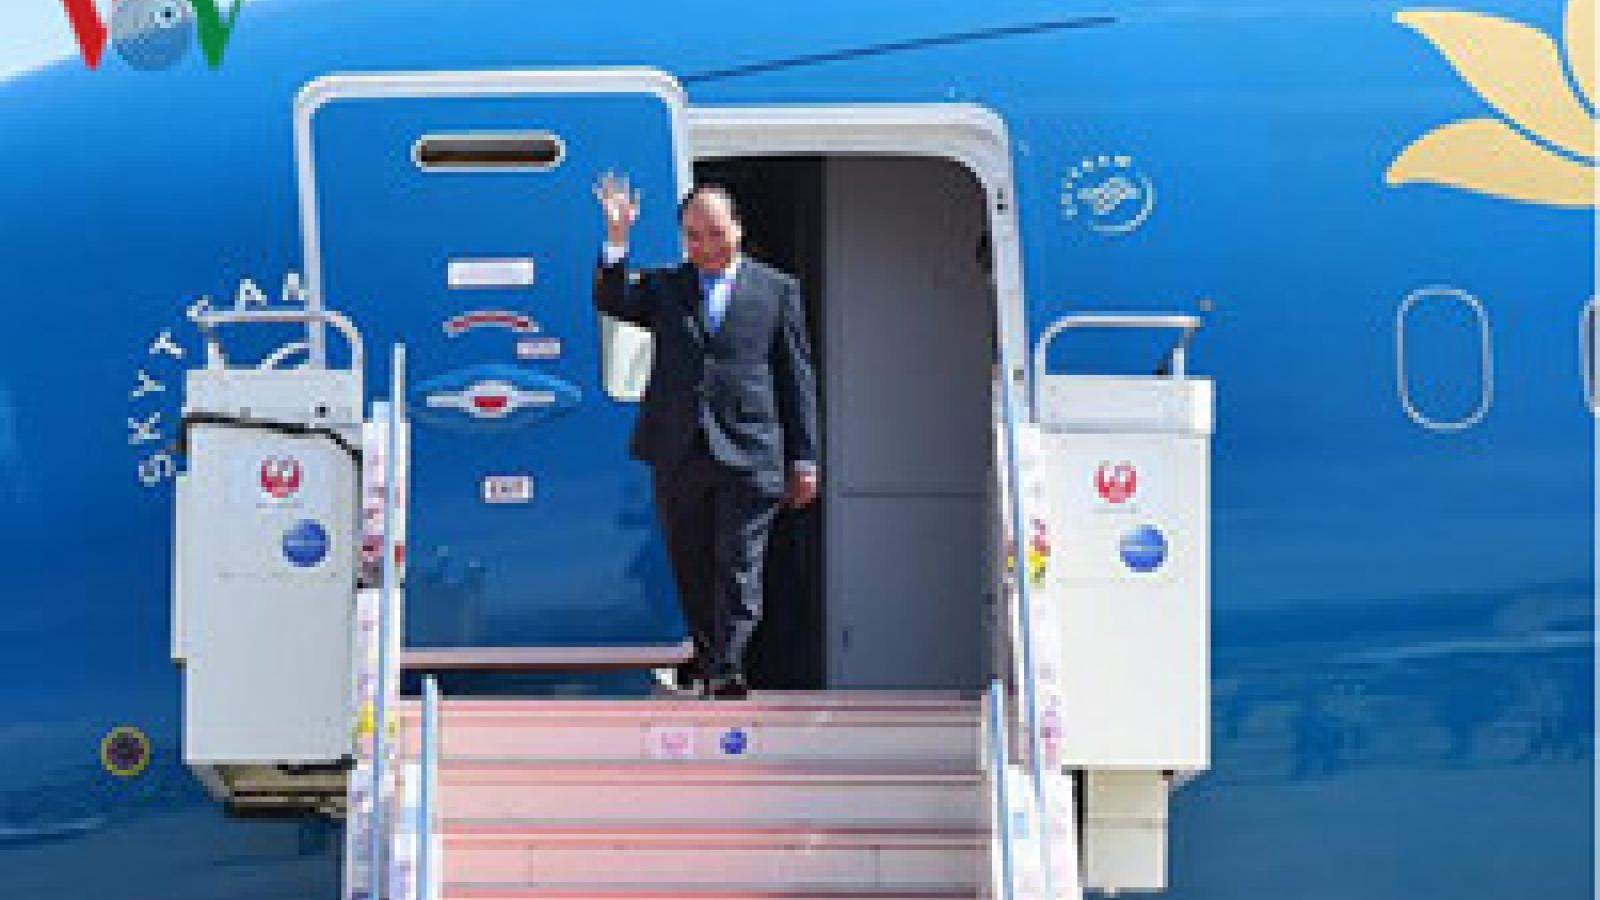 PM leaves Hanoi for ASEAN Summit in Laos